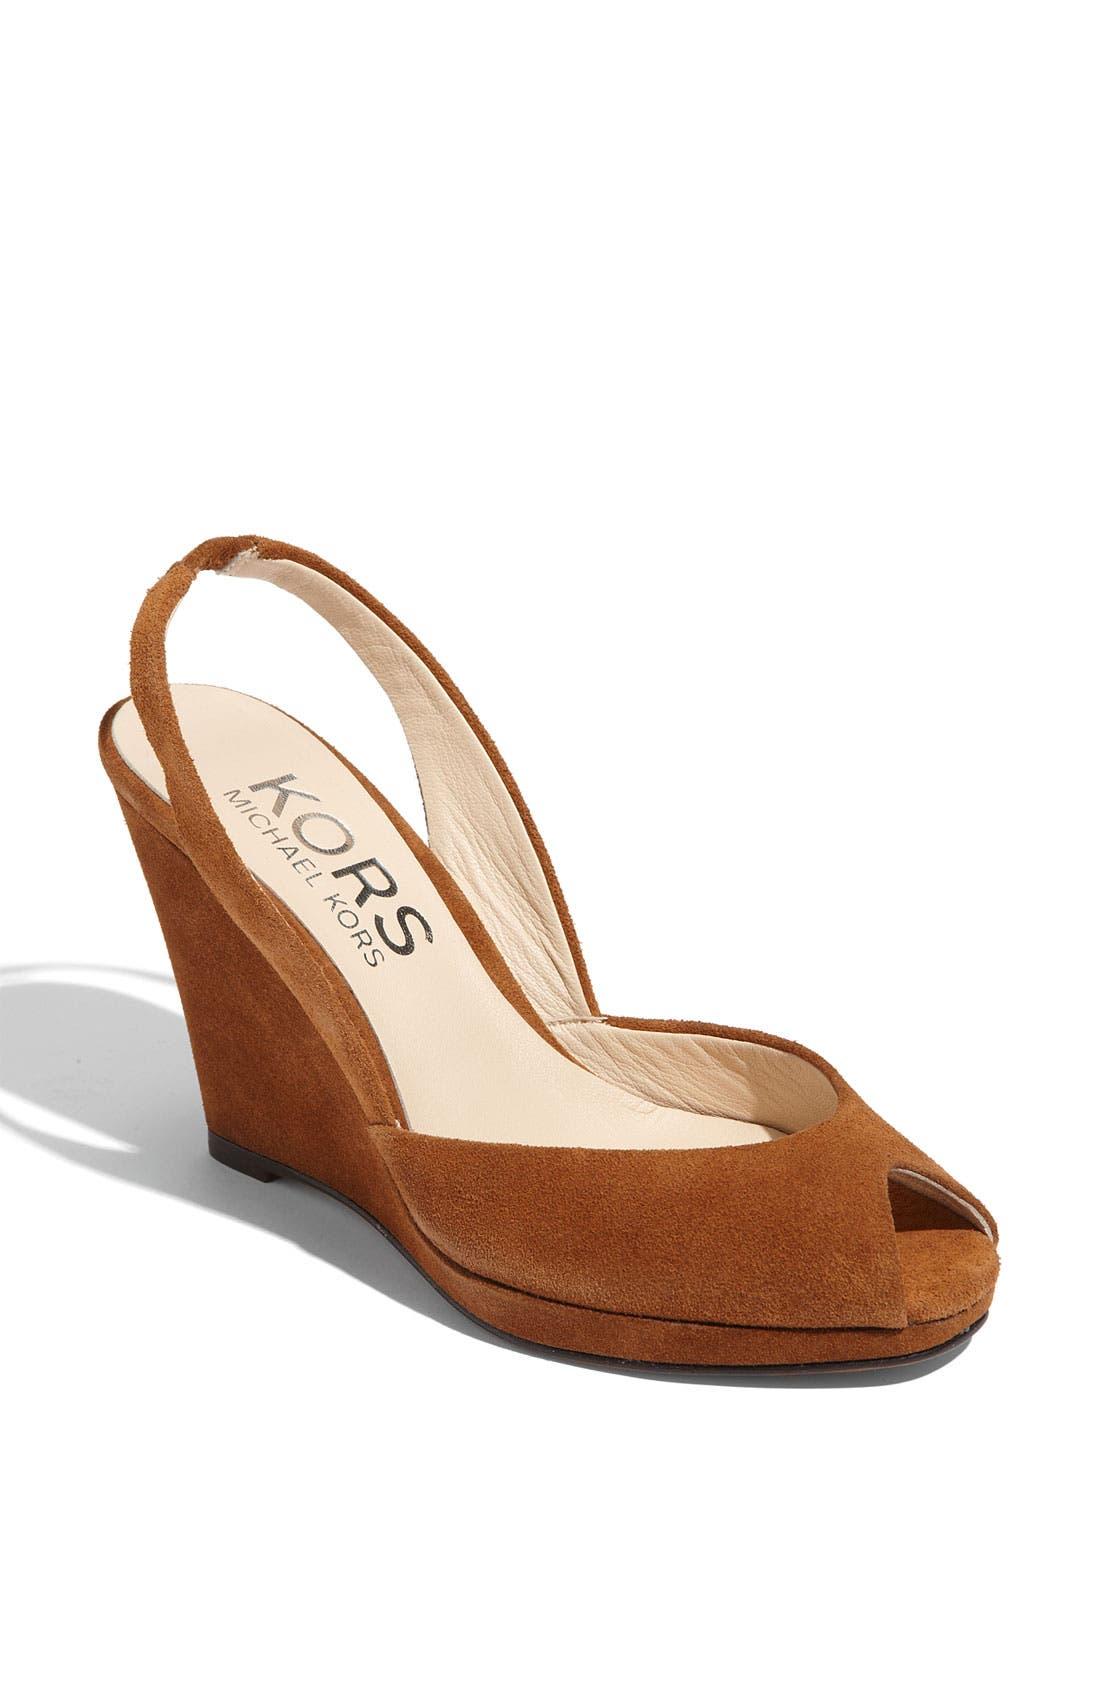 Main Image - KORS Michael Kors 'Vivian' Sandal